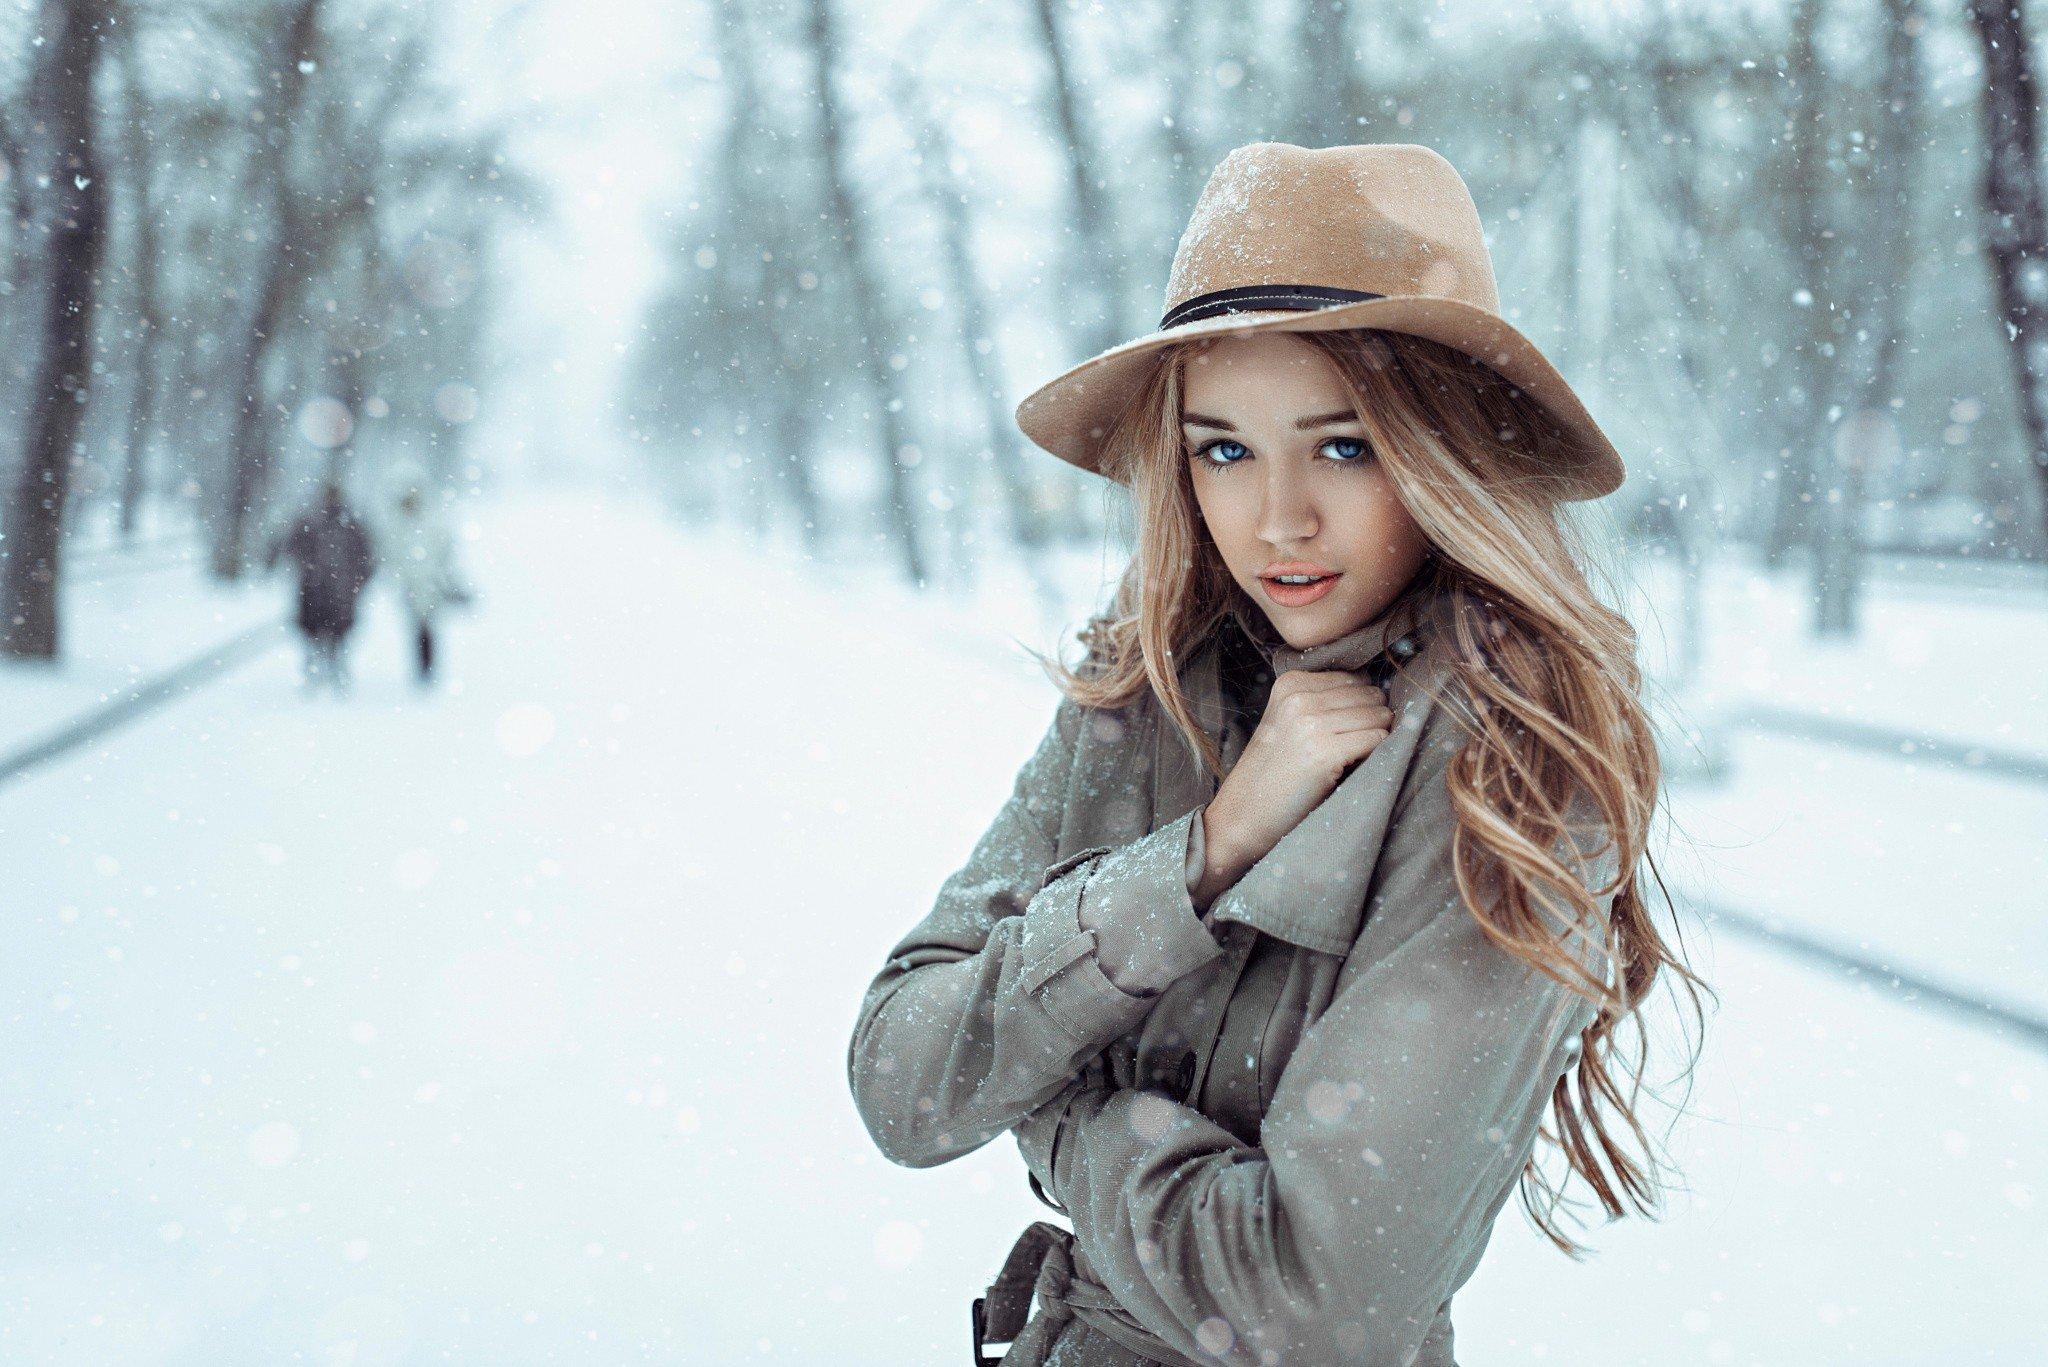 Women, Model, Blonde, Long Hair, Blue Eyes, Open Mouth, Looking At Viewer, Winter -2121